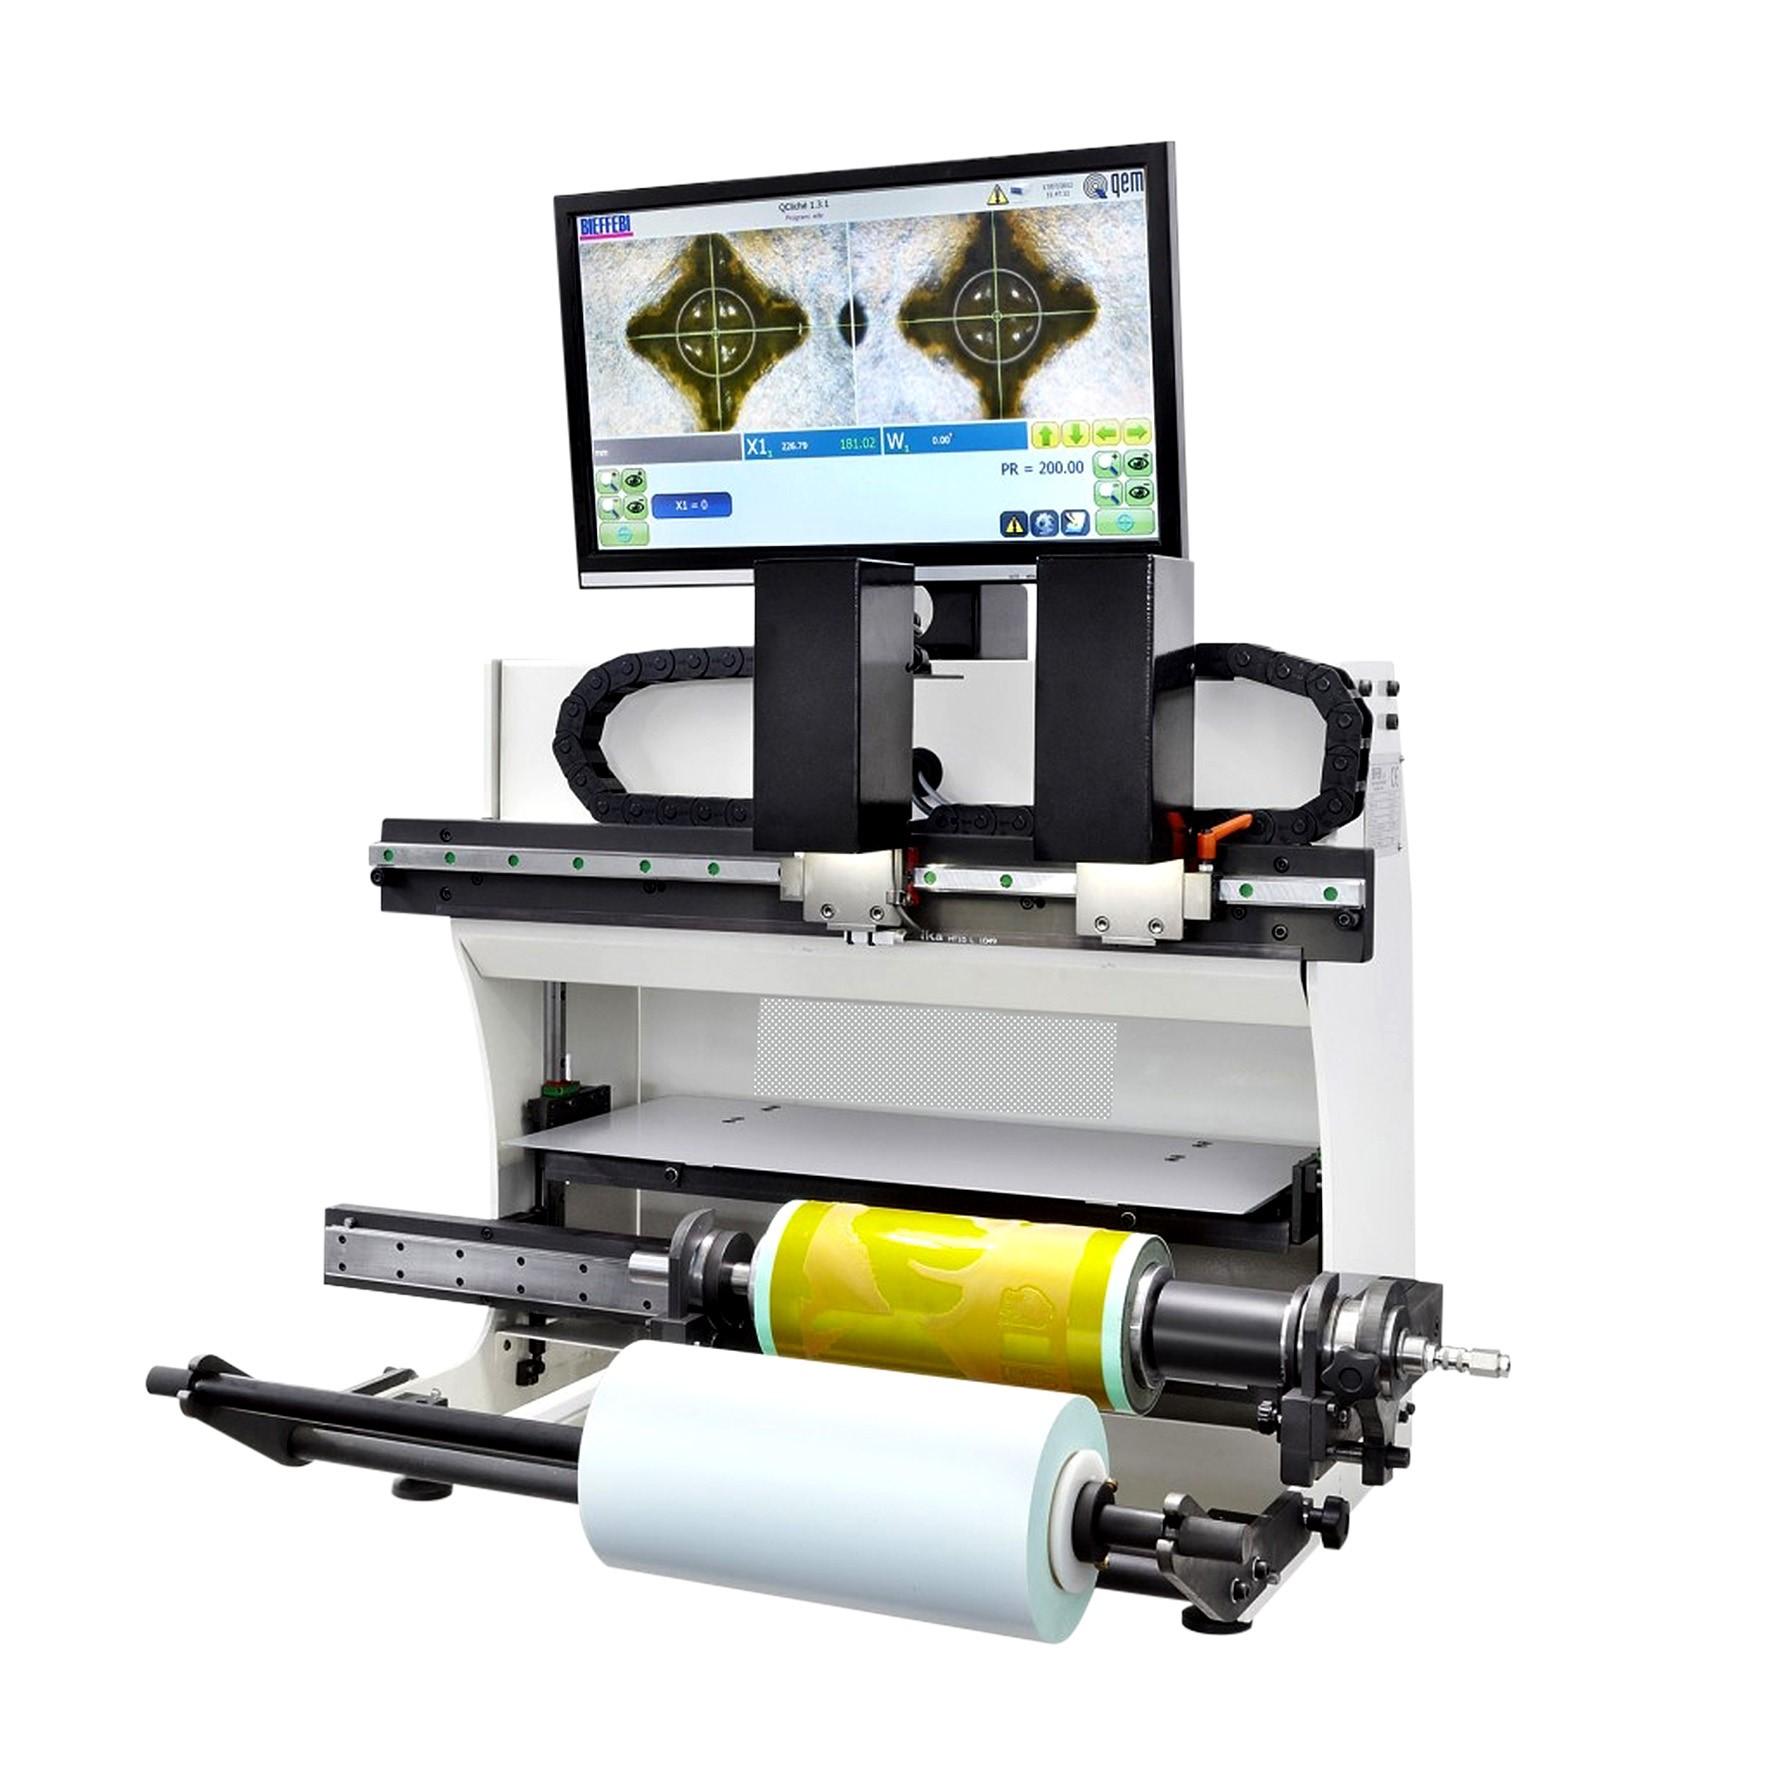 Flexographic_Printing_300dpihkduQMd0qGa3z